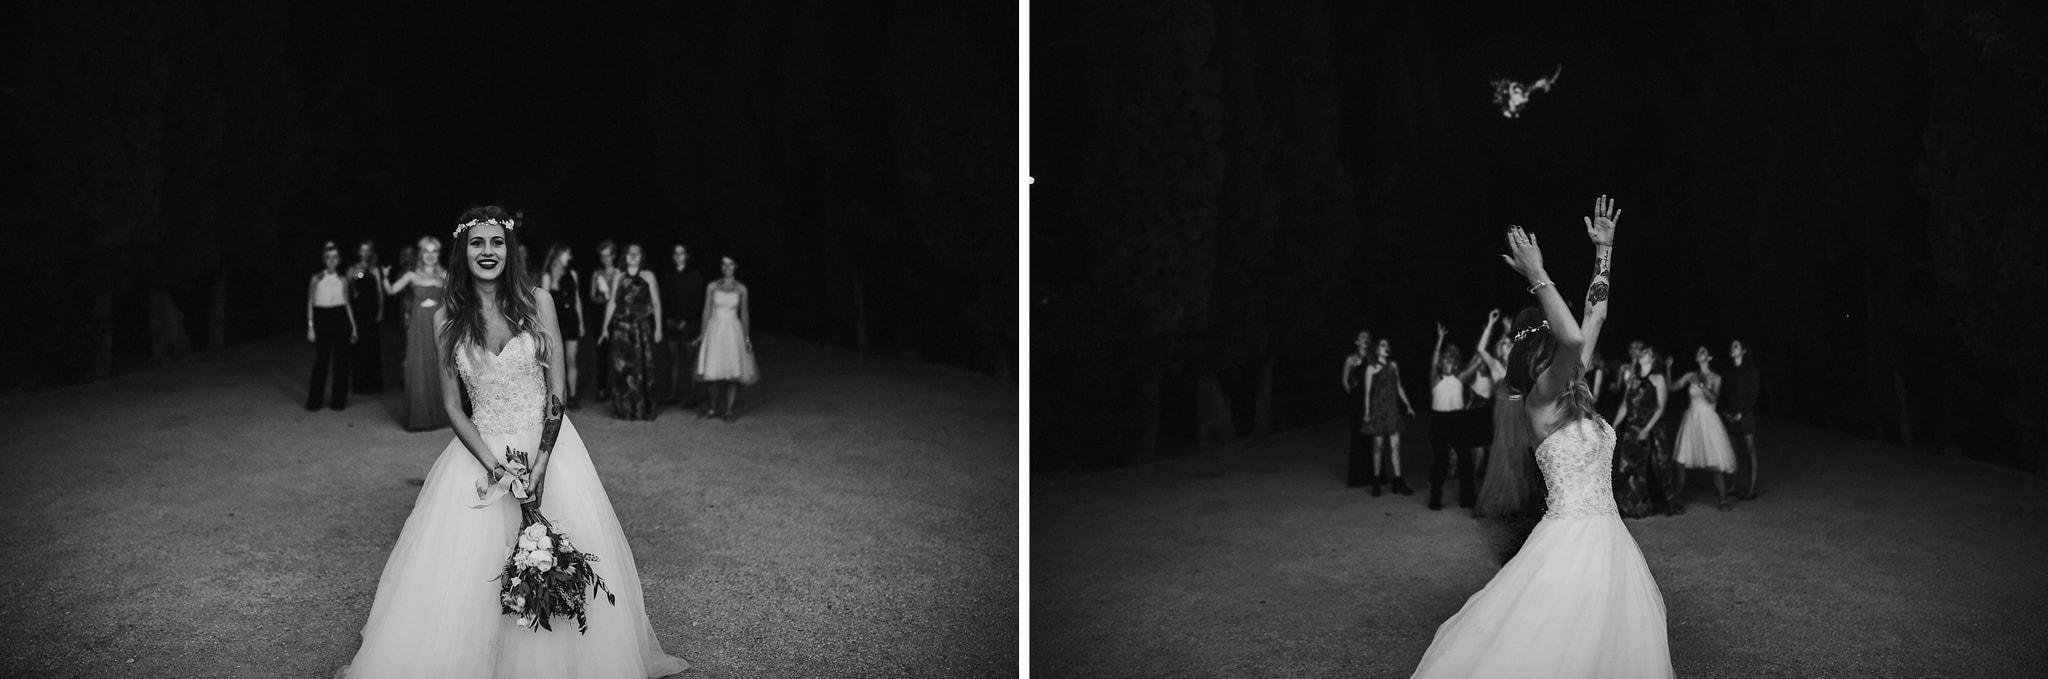 fotografo-bodas-altea-95